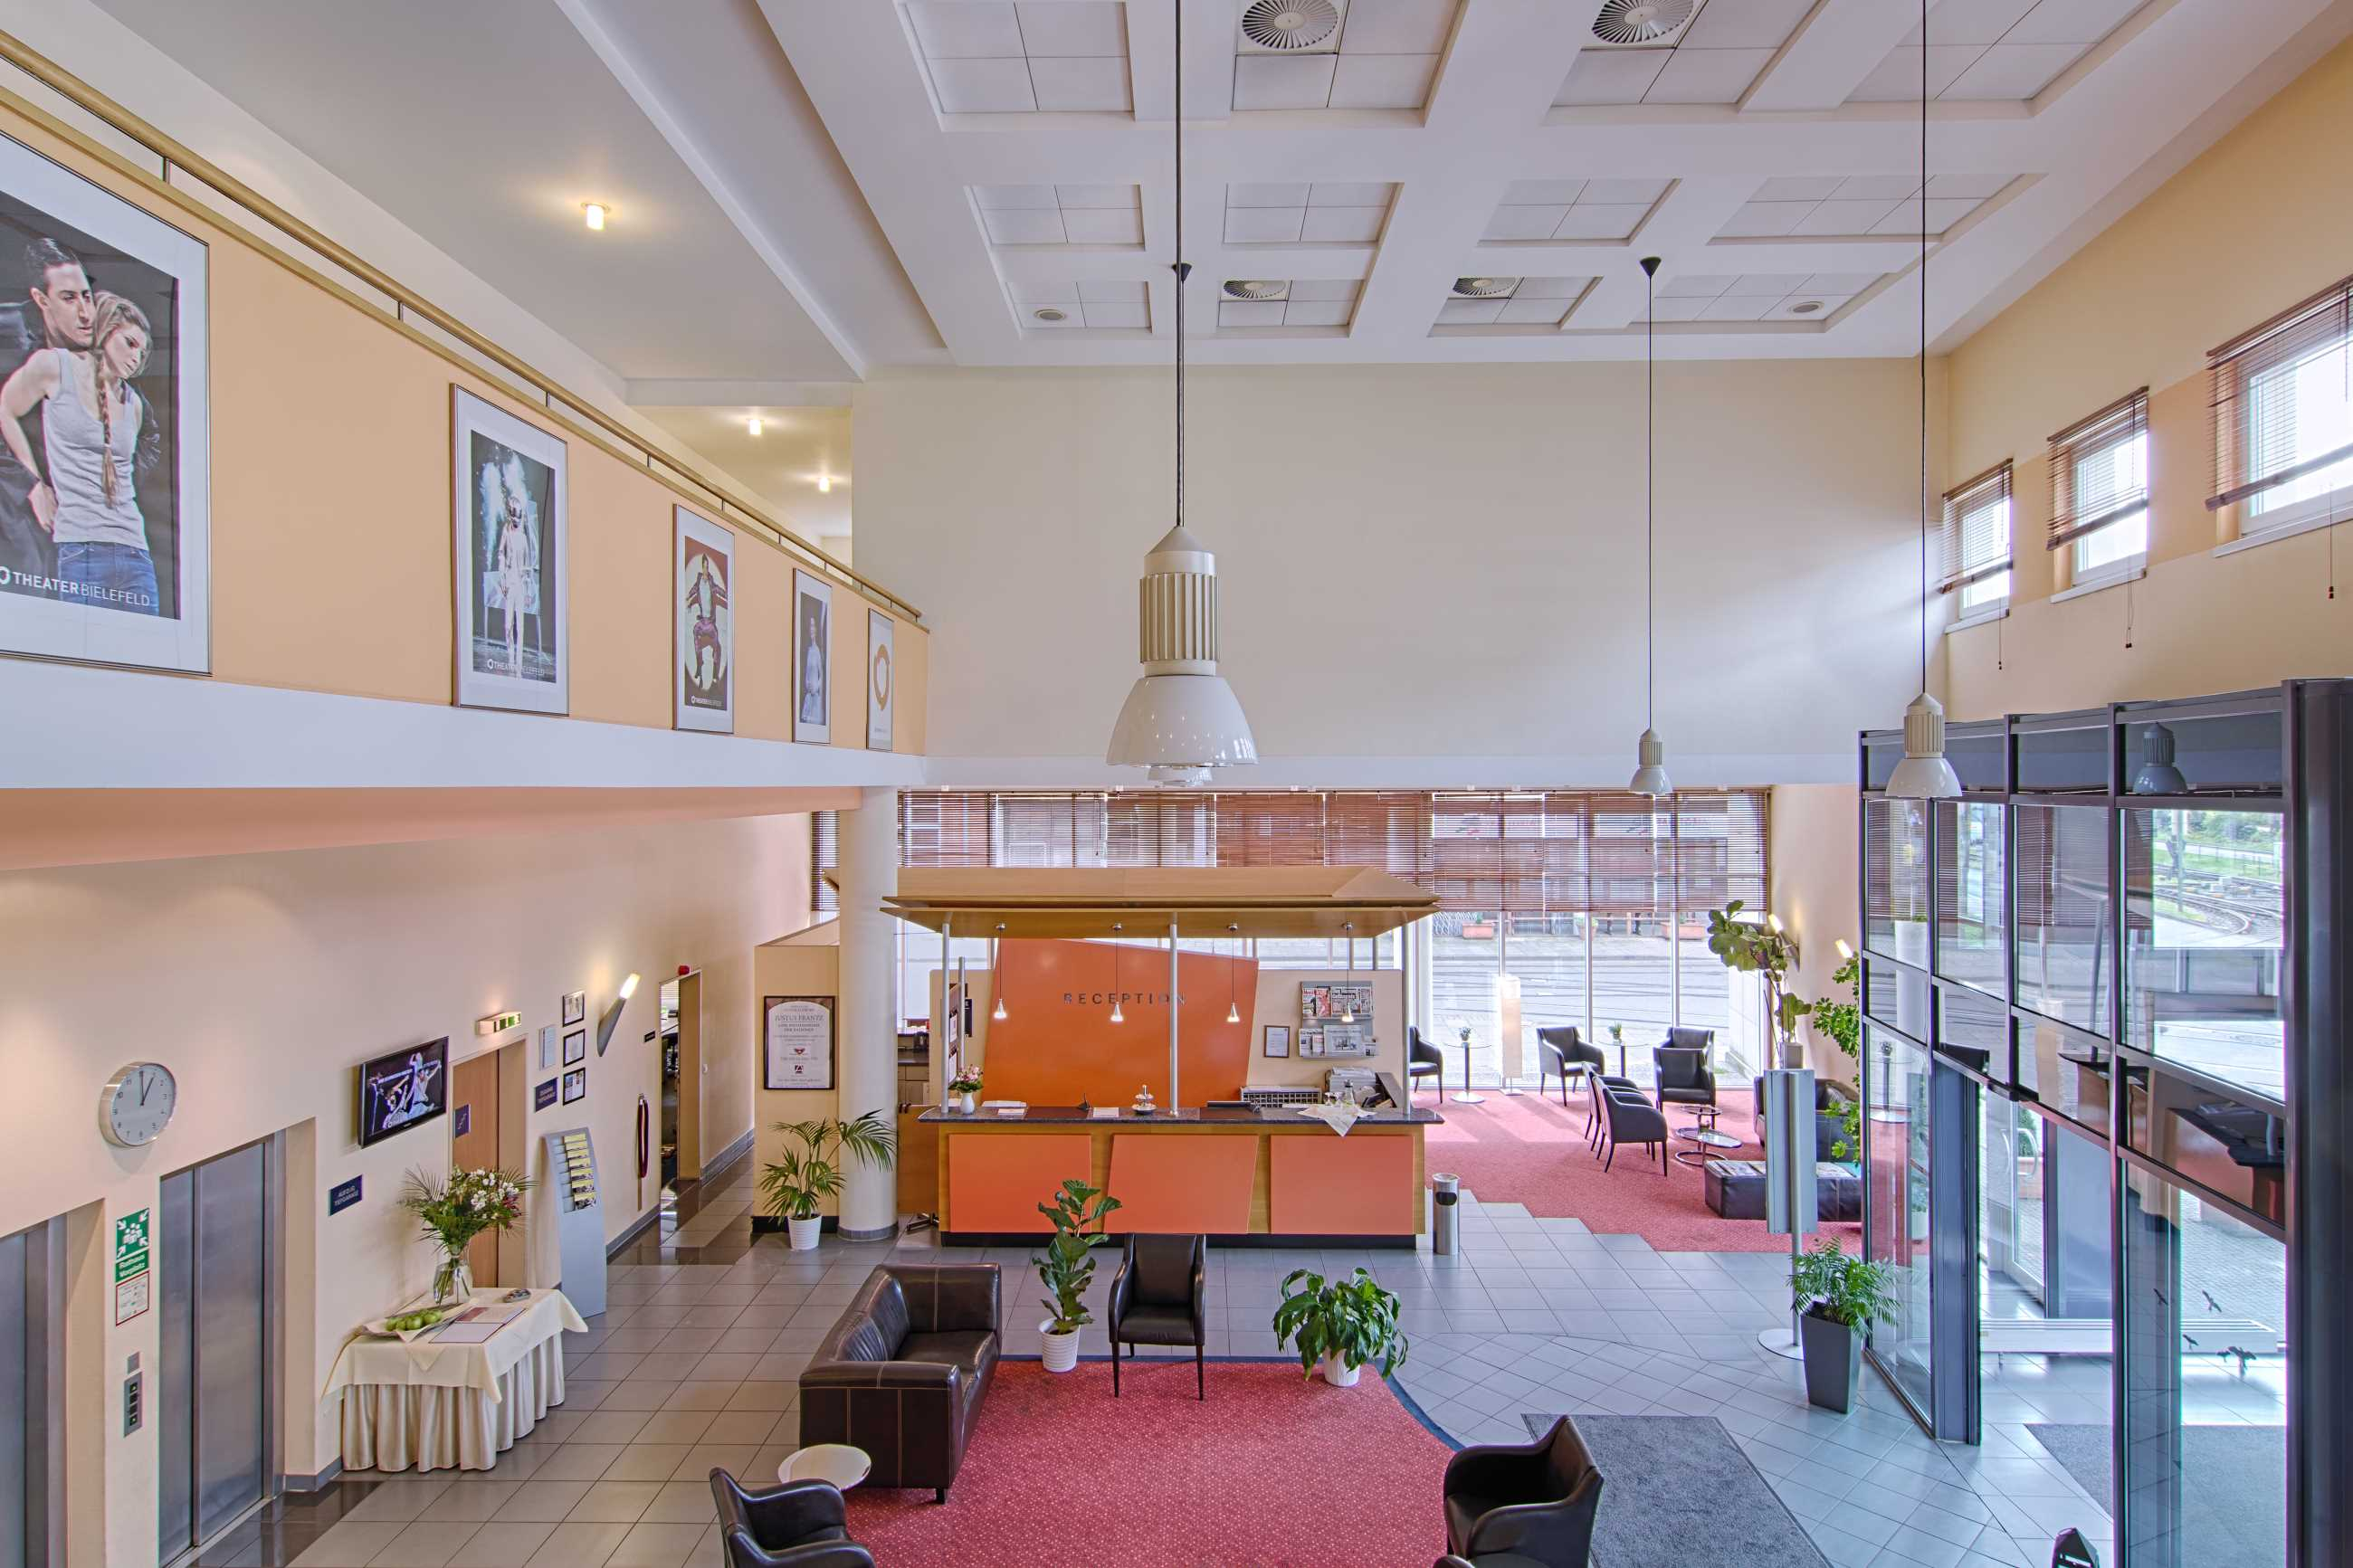 arcadia_hotel_bielefeld_lobby